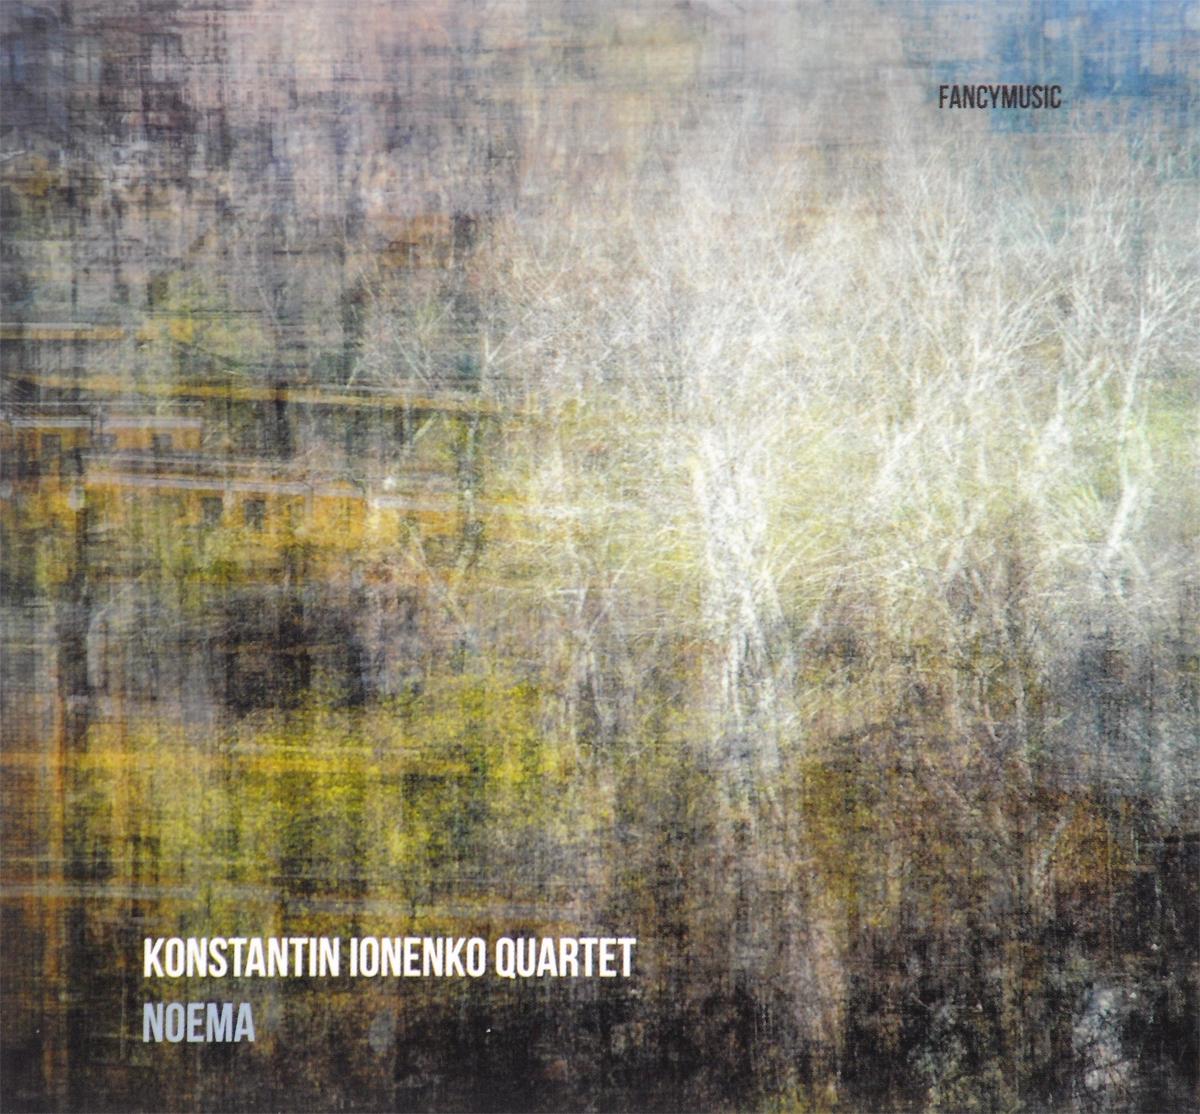 лучшая цена Konstantin Ionenko Quintet Konstantin Ionenko Quintet. Noema